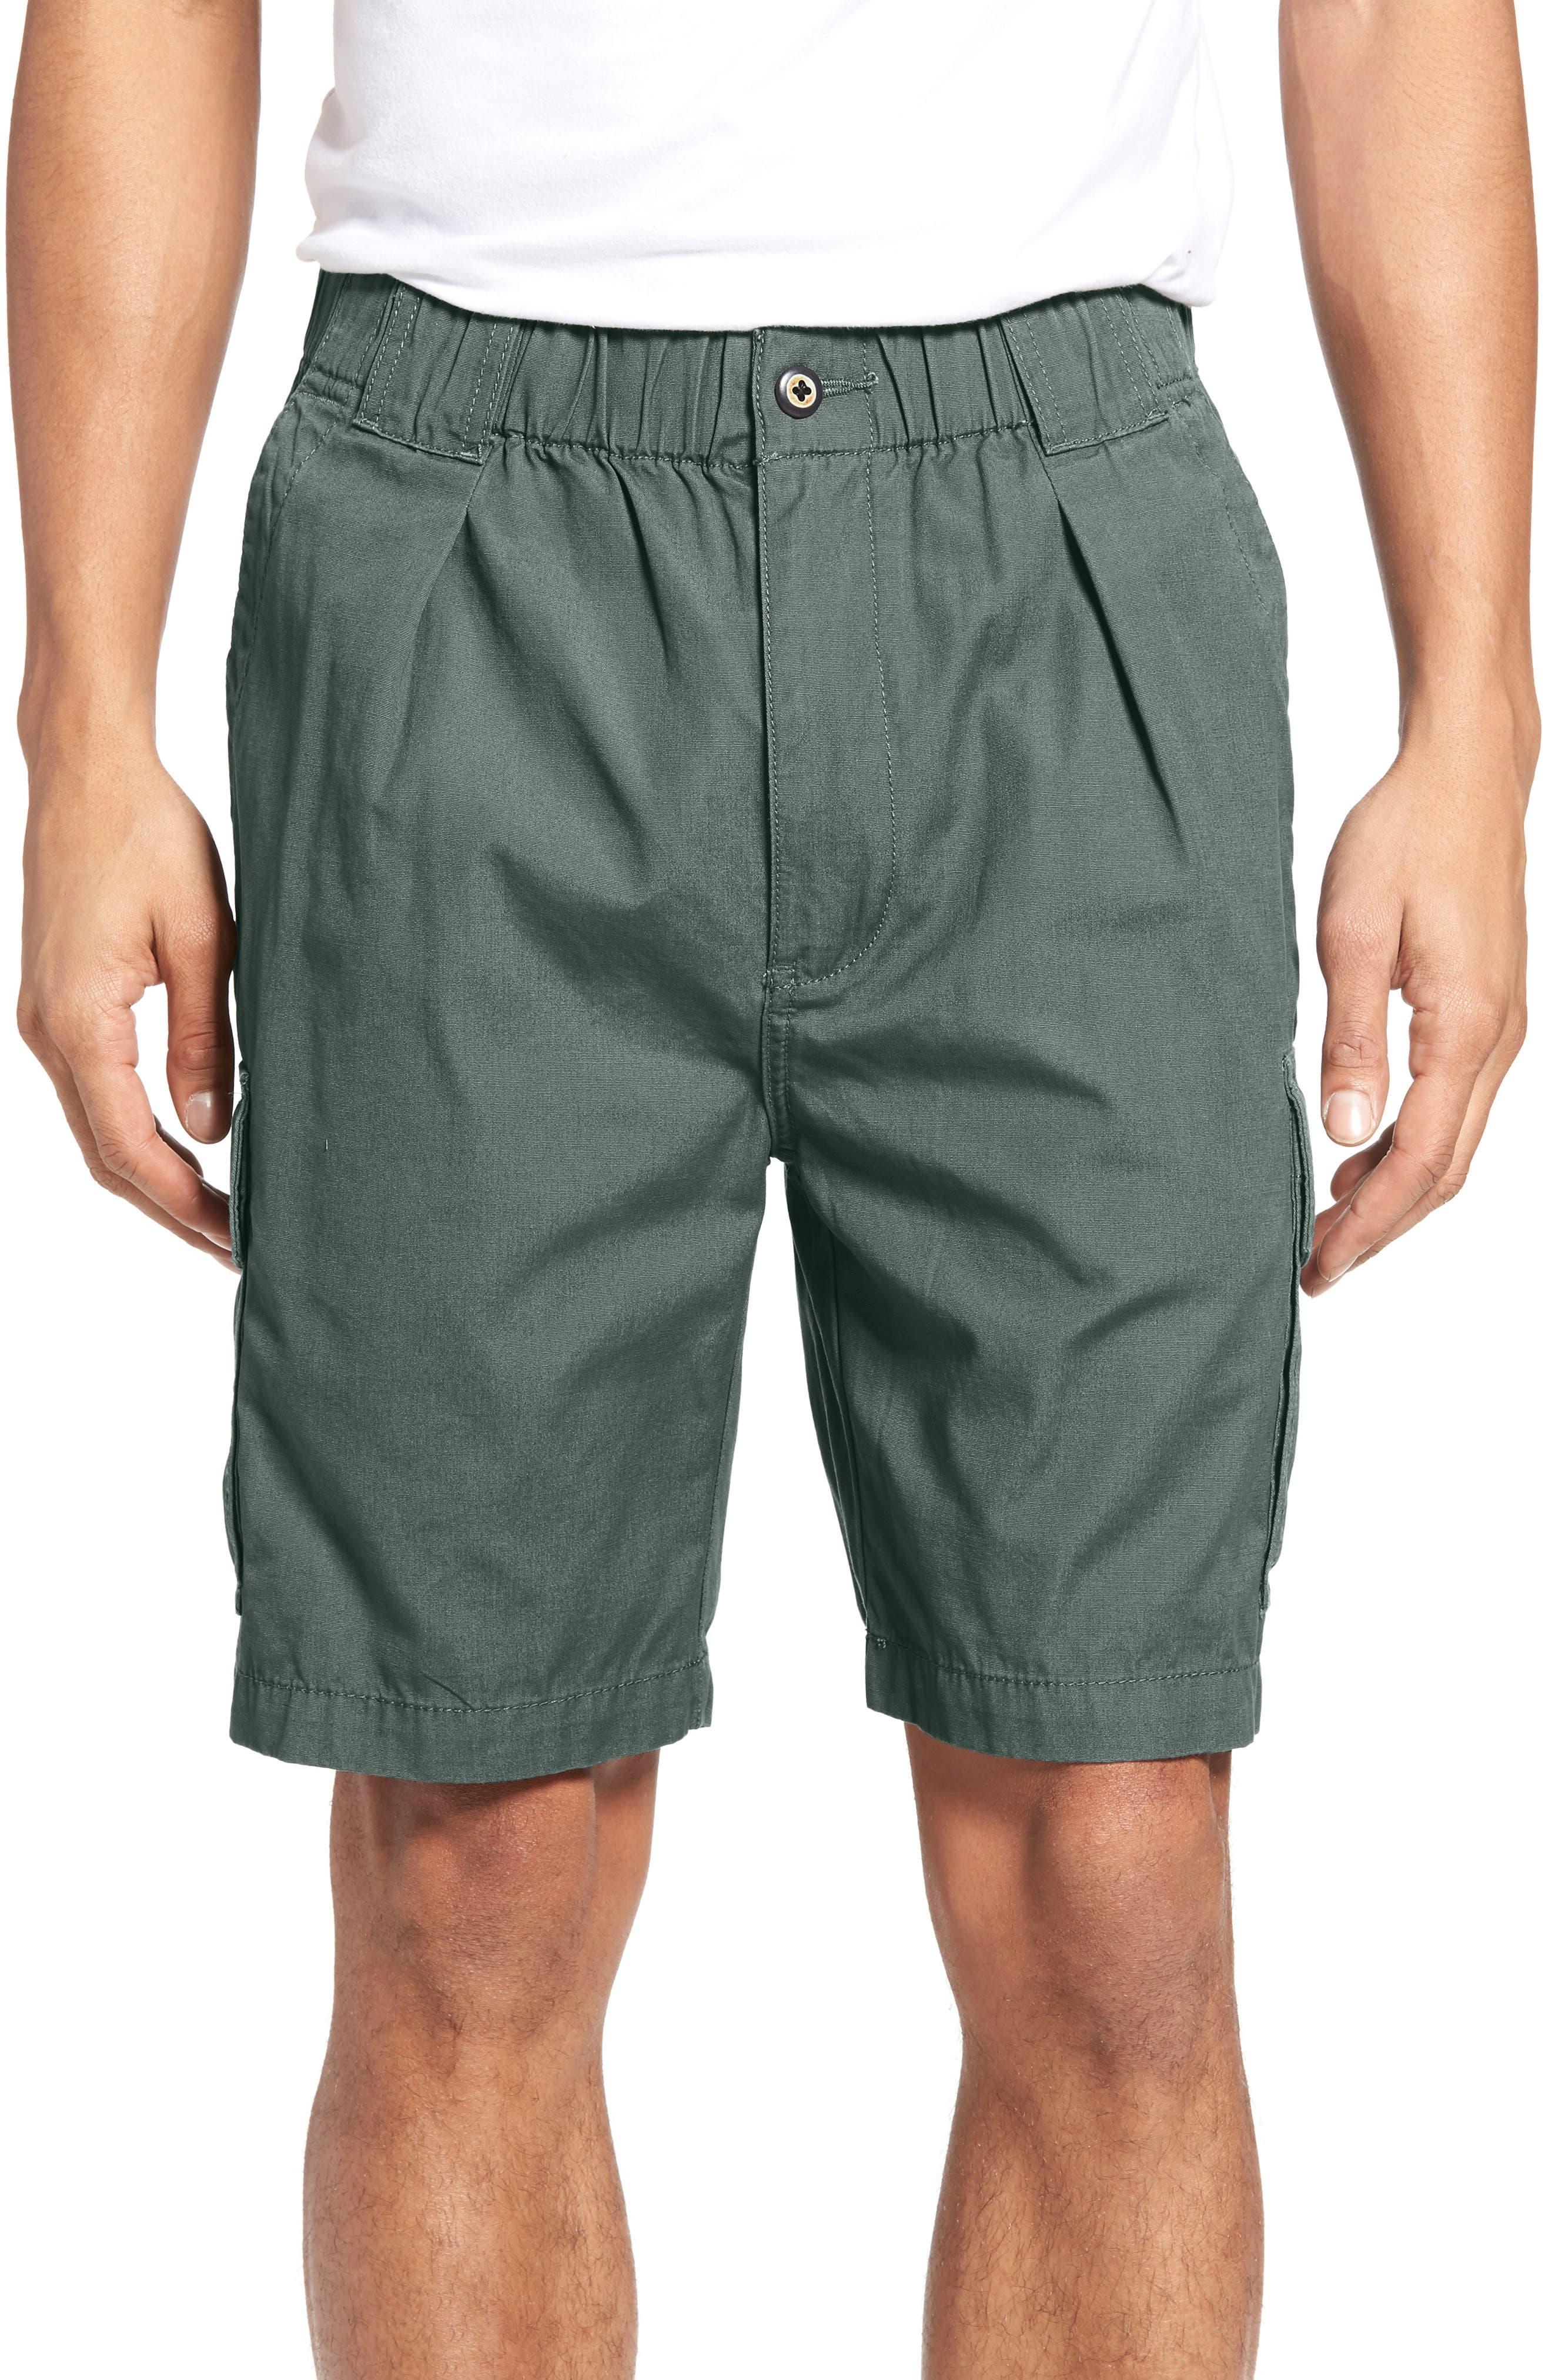 Main Image - Tommy Bahama 'Survivor' Cargo Shorts (Big & Tall)